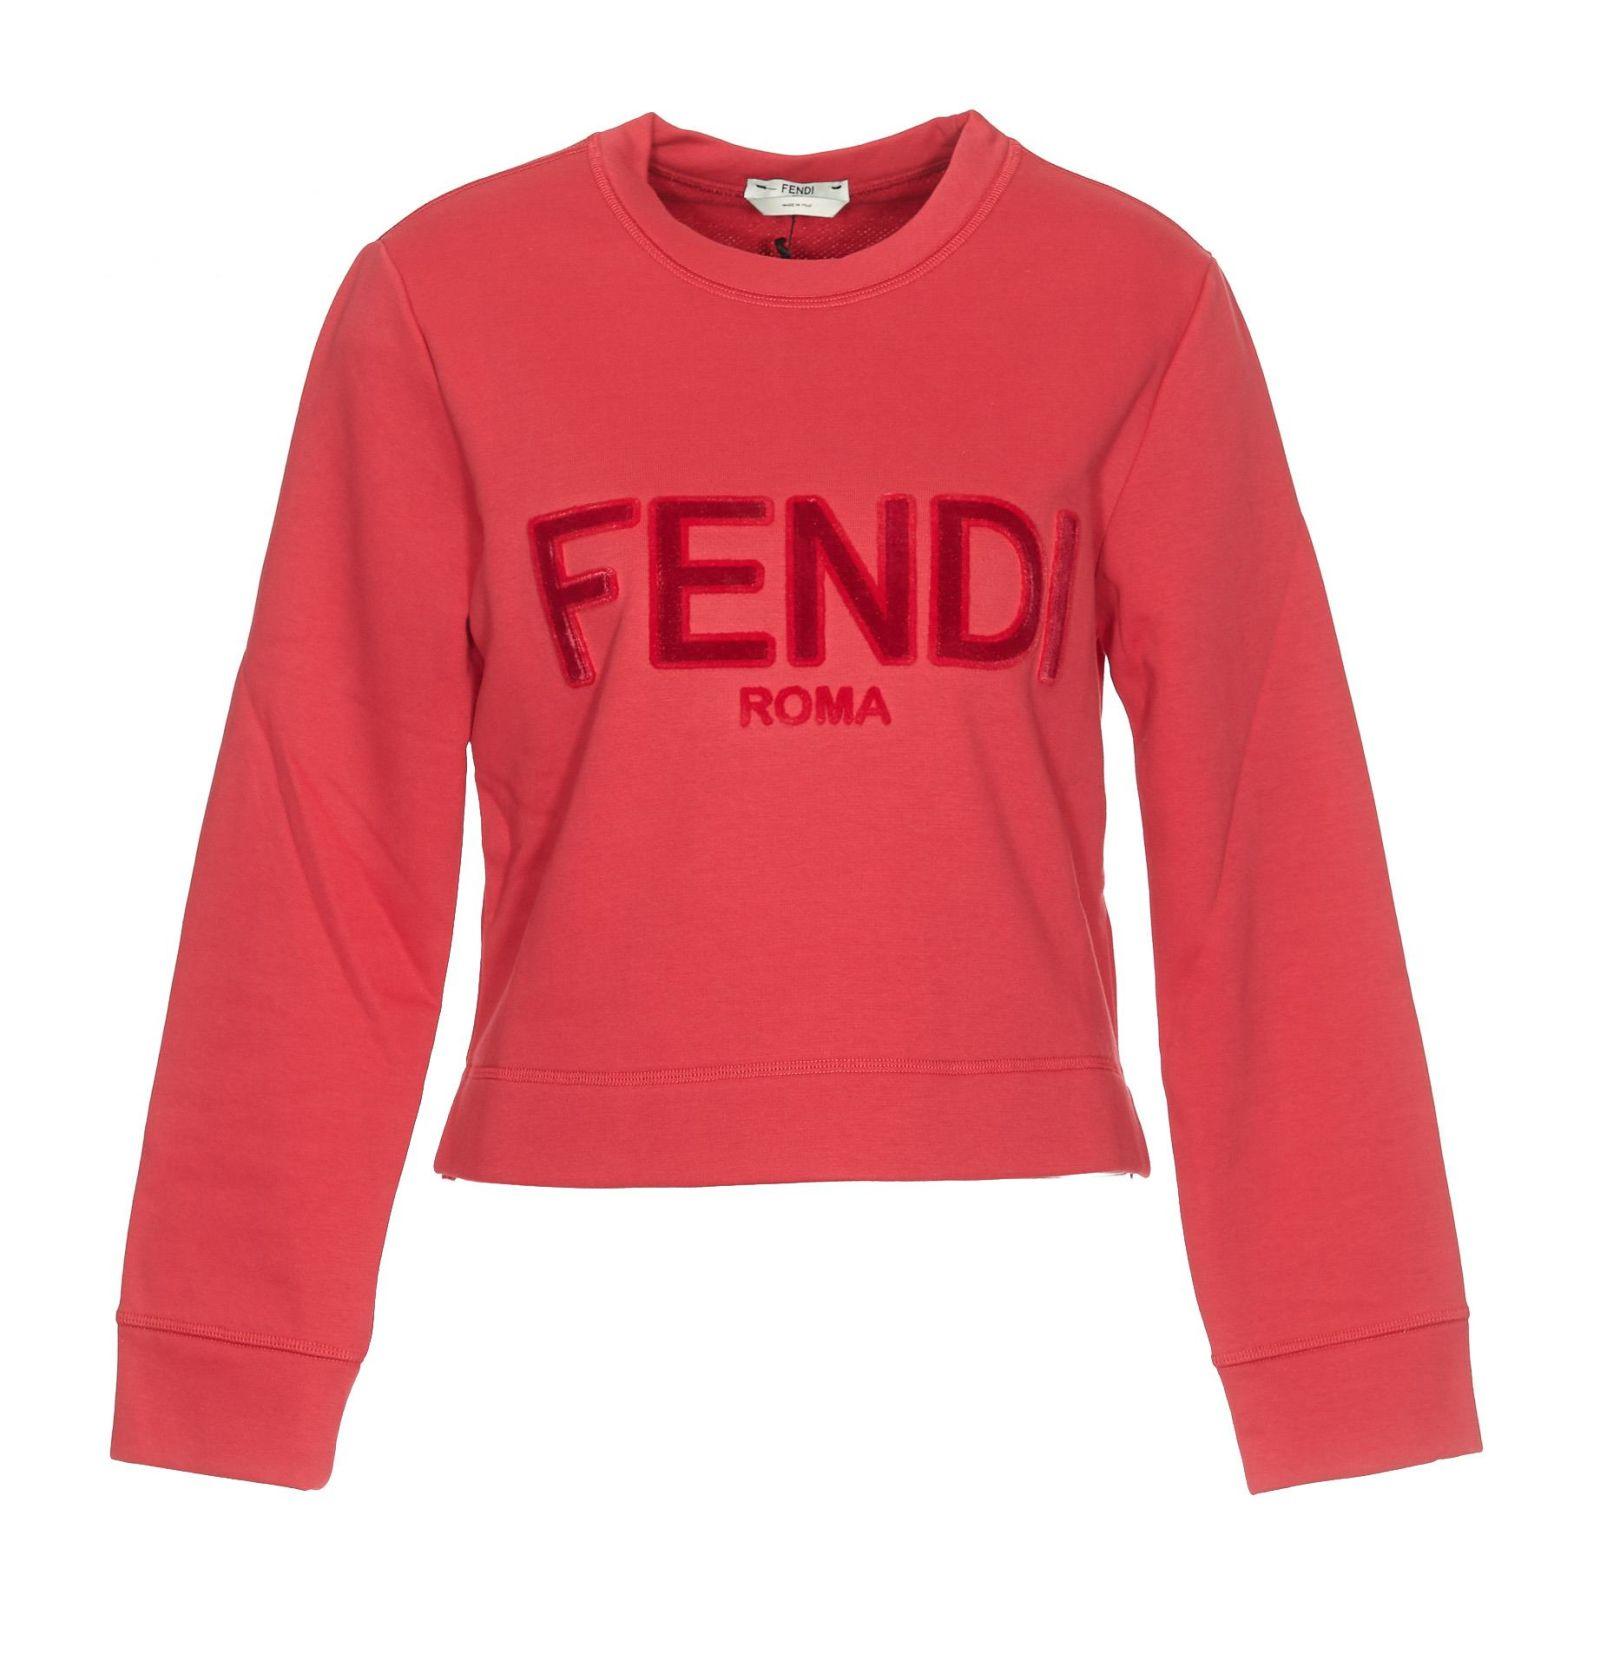 6d01319e2 italist   Best price in the market for Fendi Fendi Fendi Roma Sweatshirt -  Jelly -. Mens Fendi T Shirt Rrp £290 Designer ...